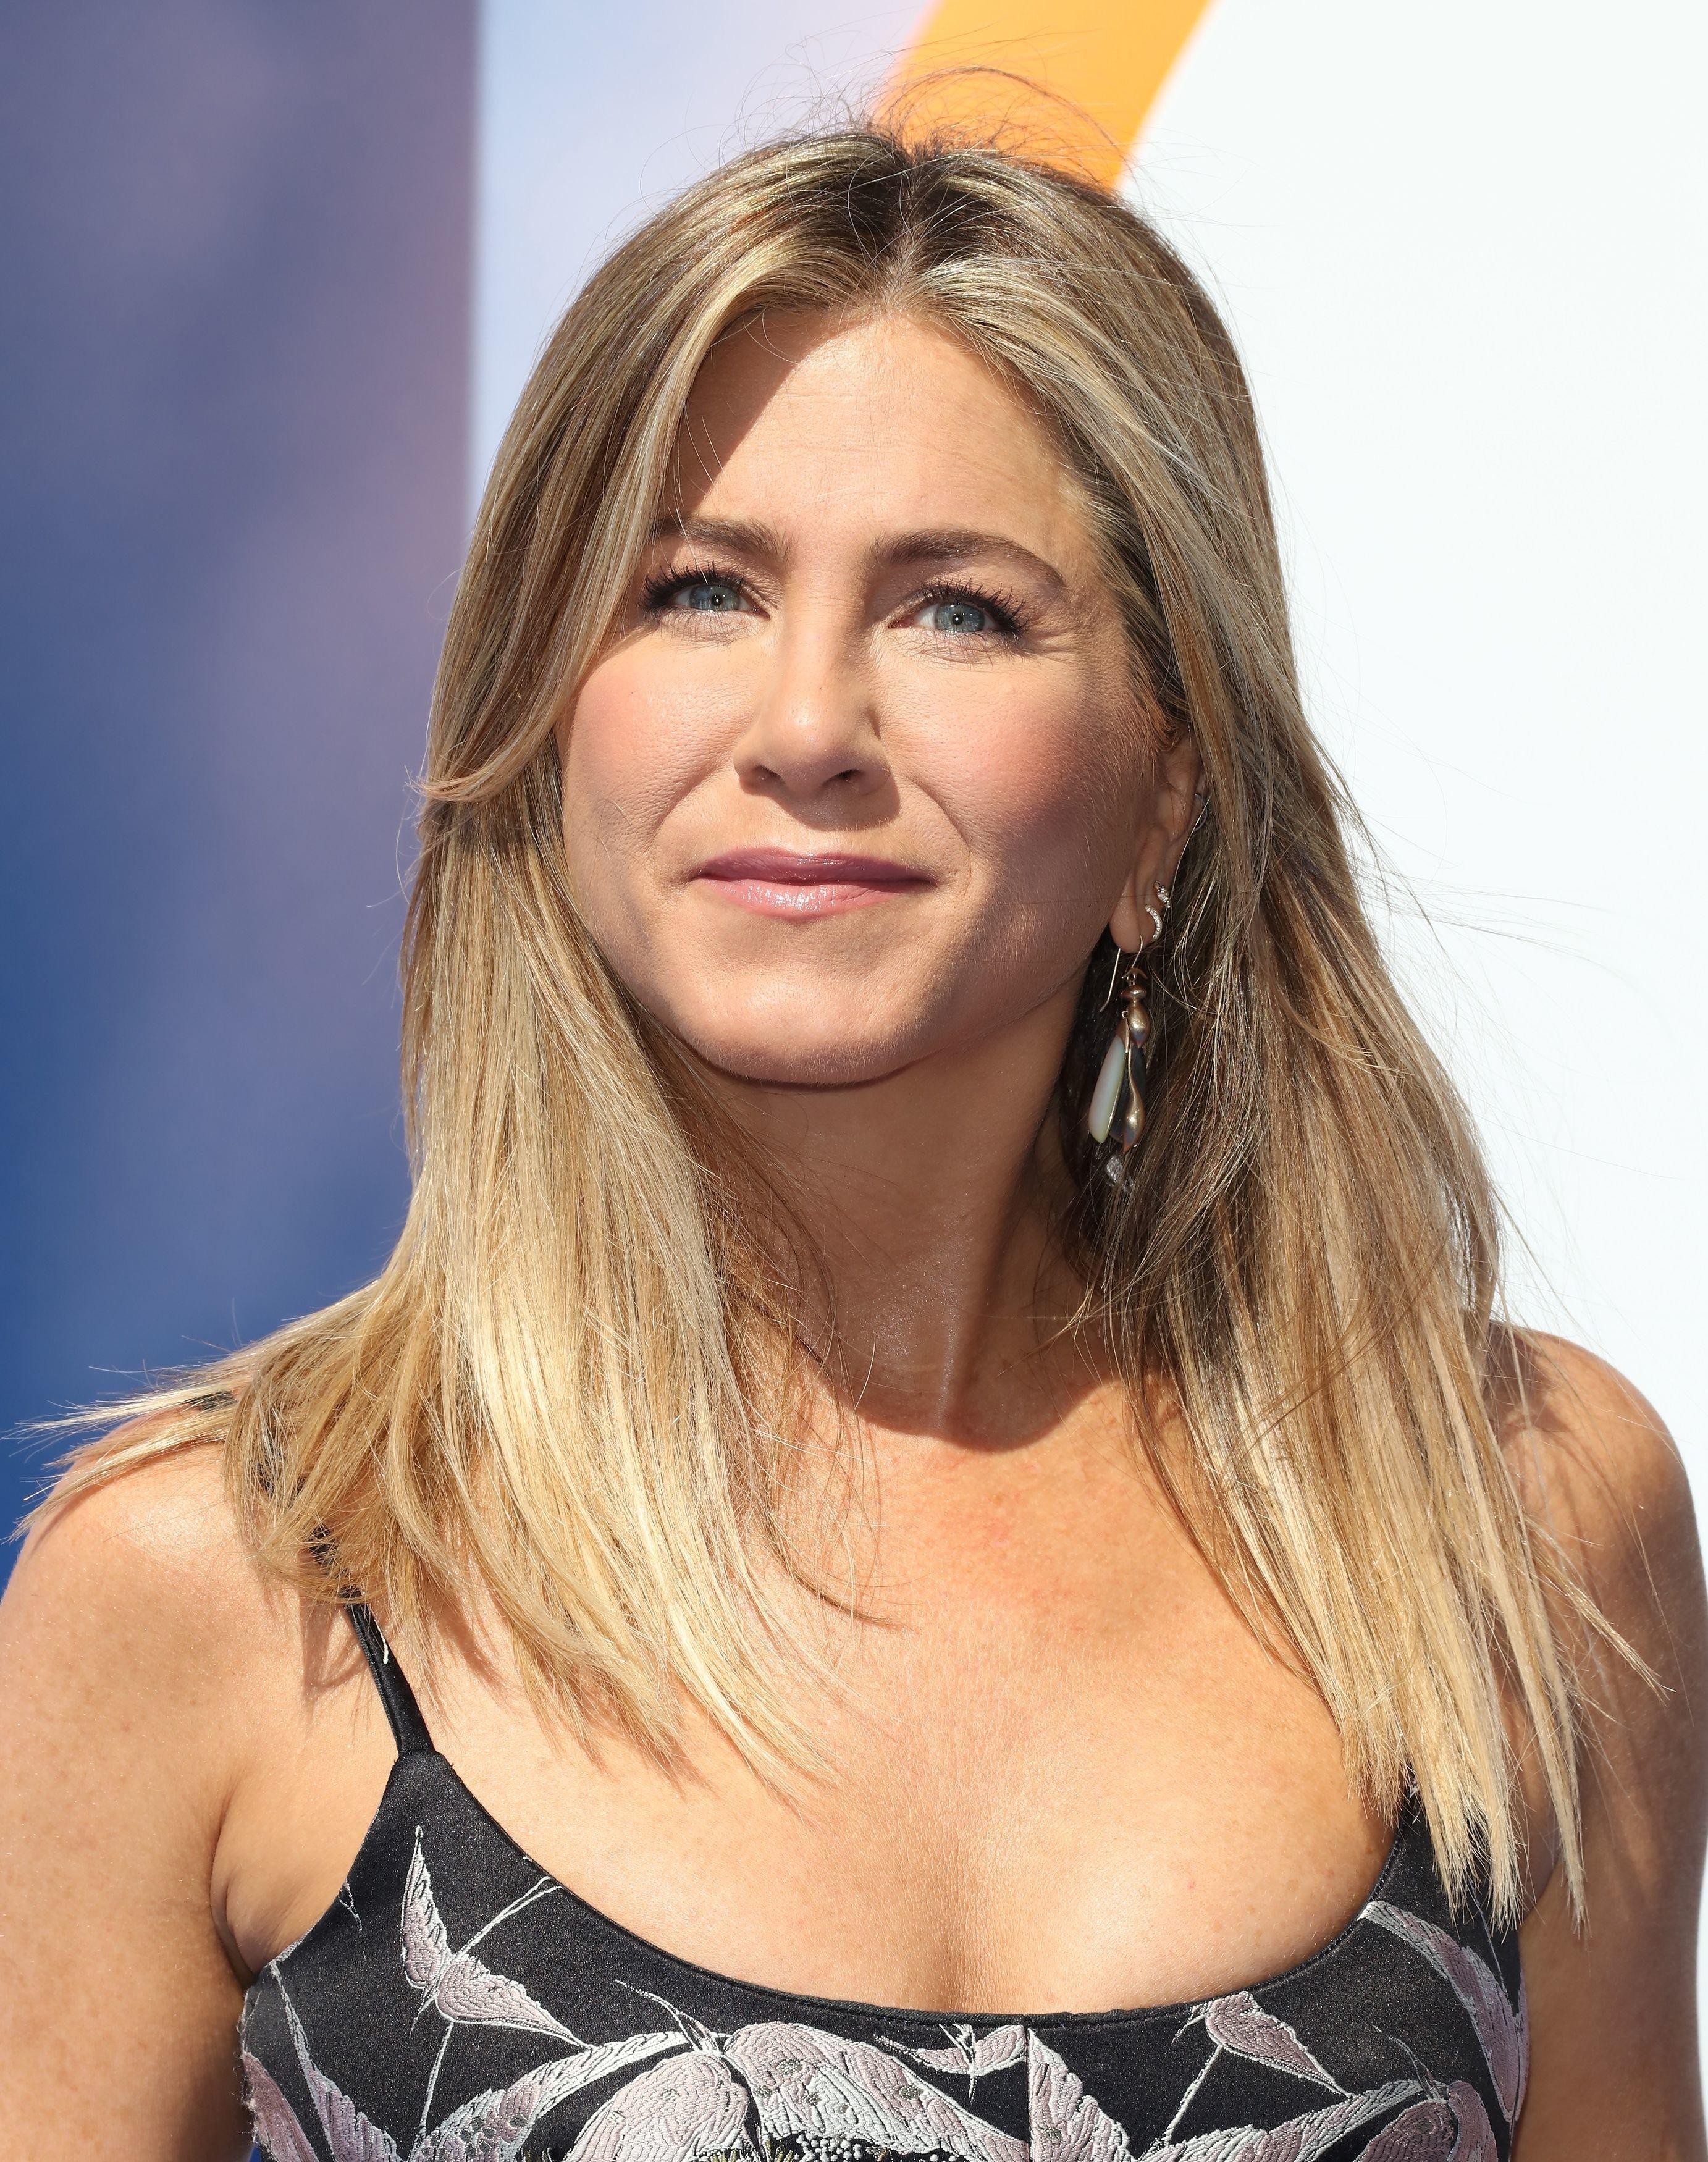 Leave Jennifer Aniston Out Of The Brangelina Divorce